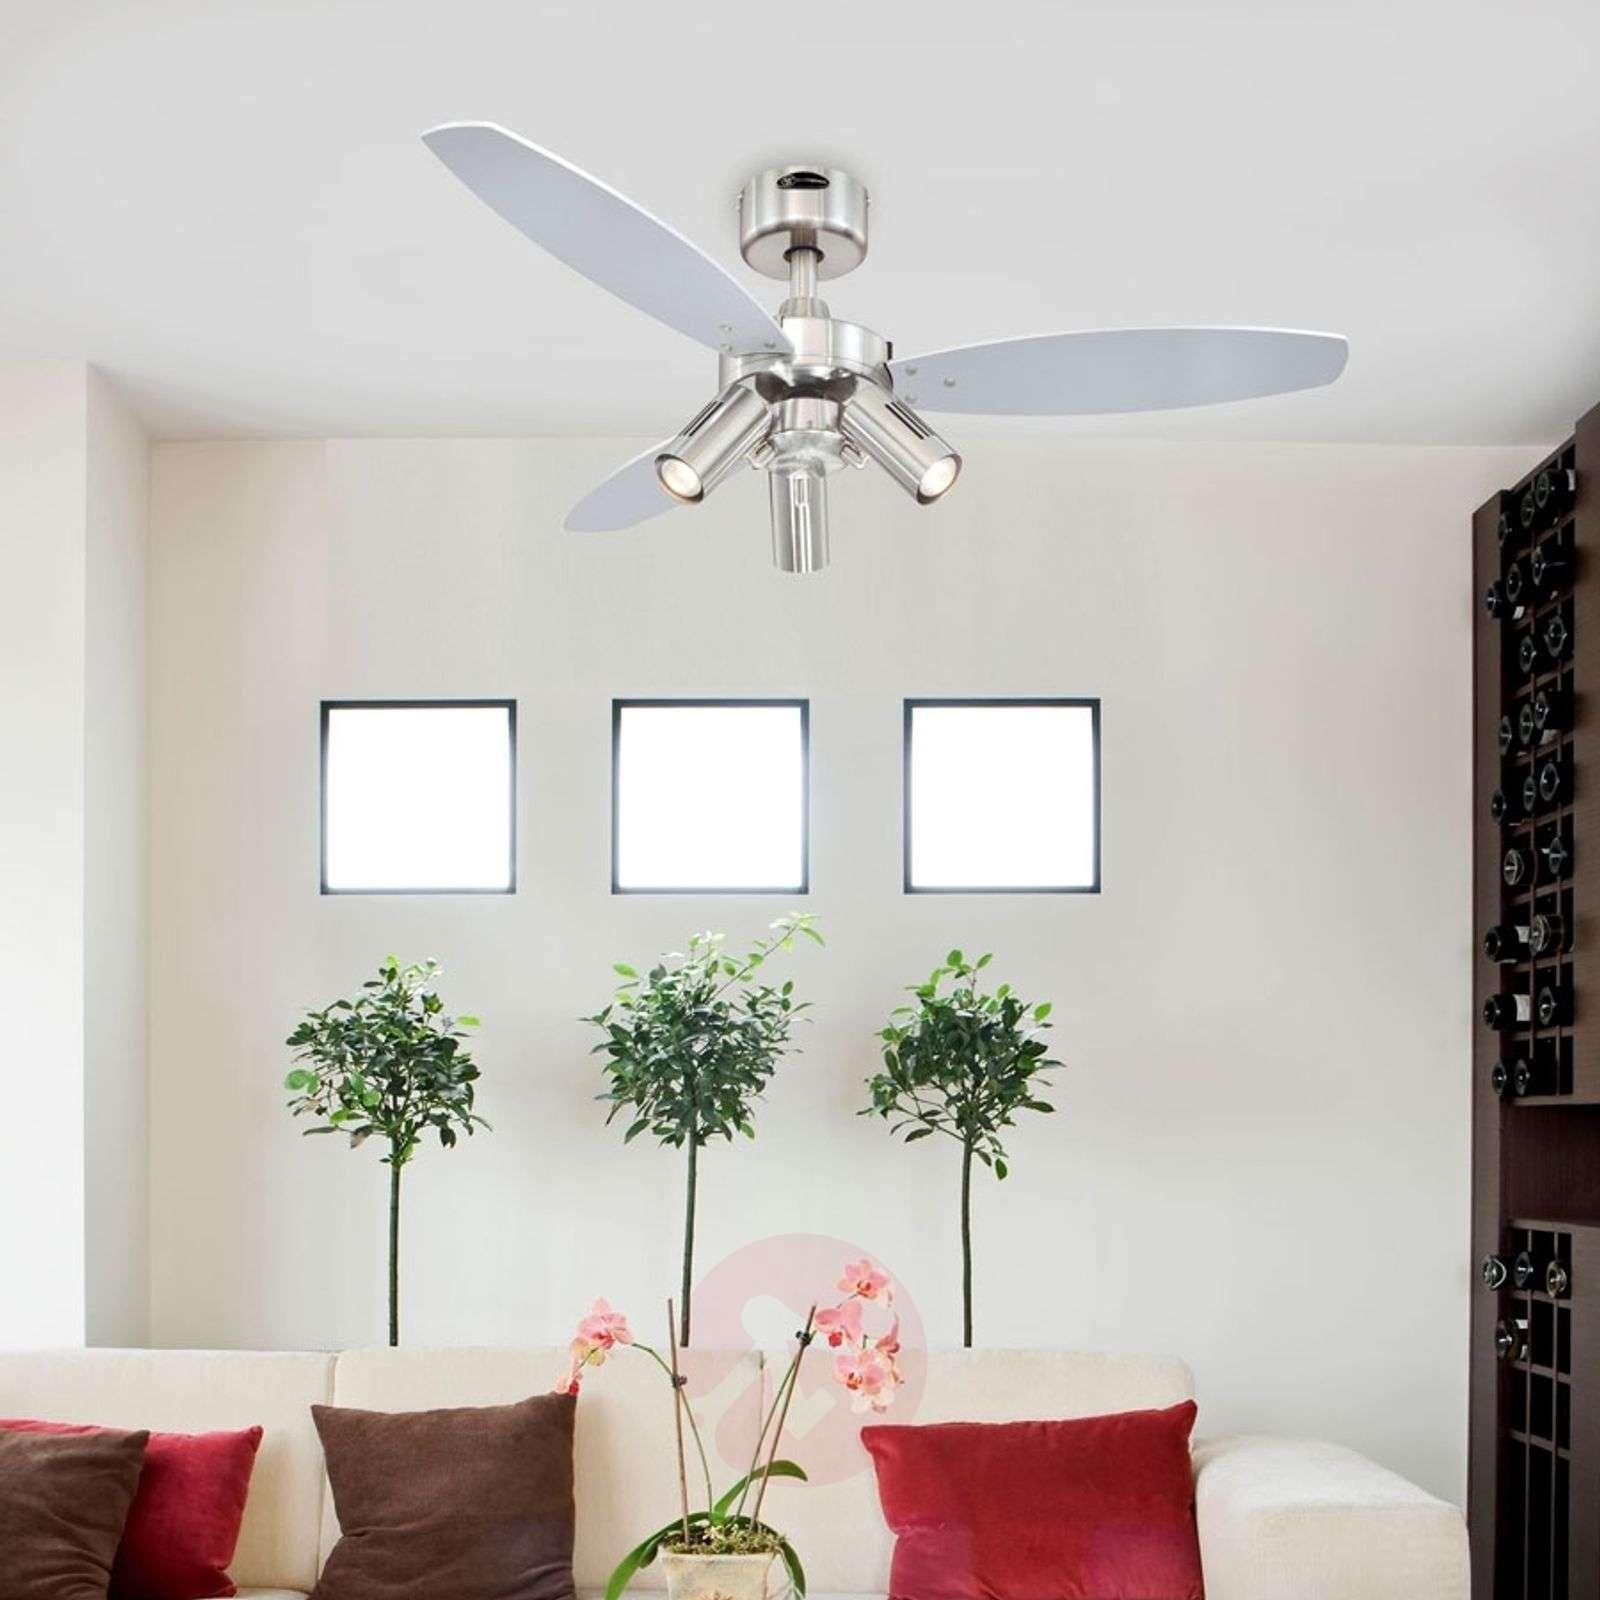 Jet Plus ceiling fan, remote control, three bulbs-9602230-02